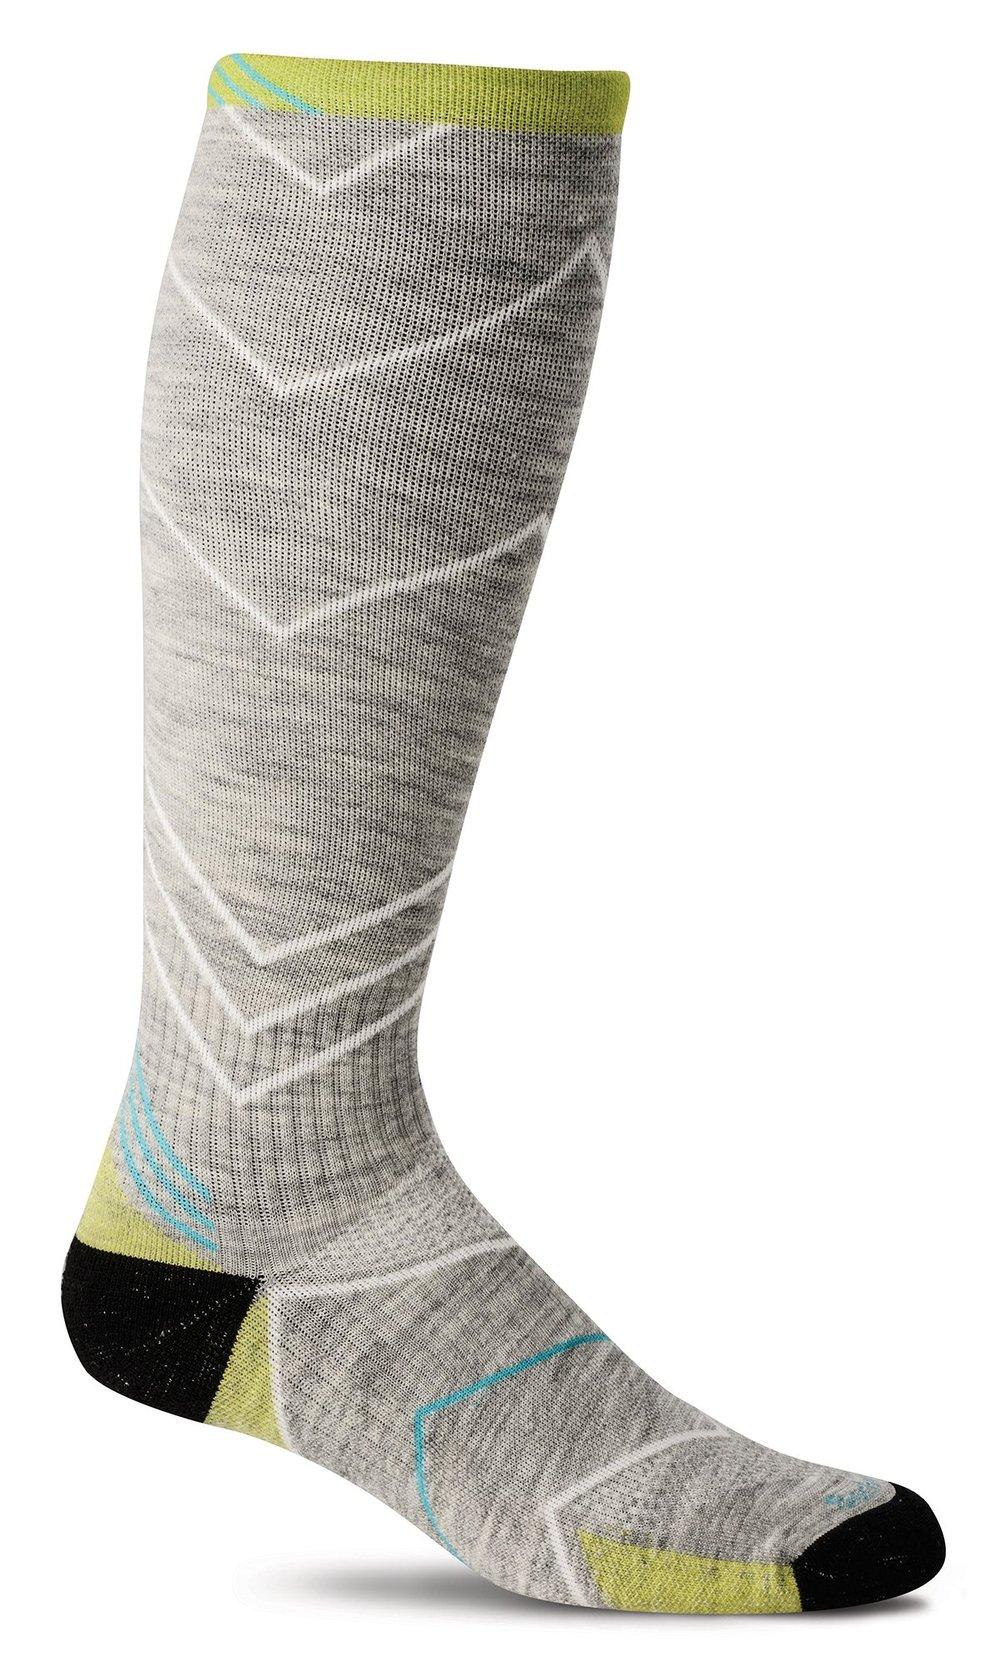 Women's Incline Knee High | Graduated Compression Socks-